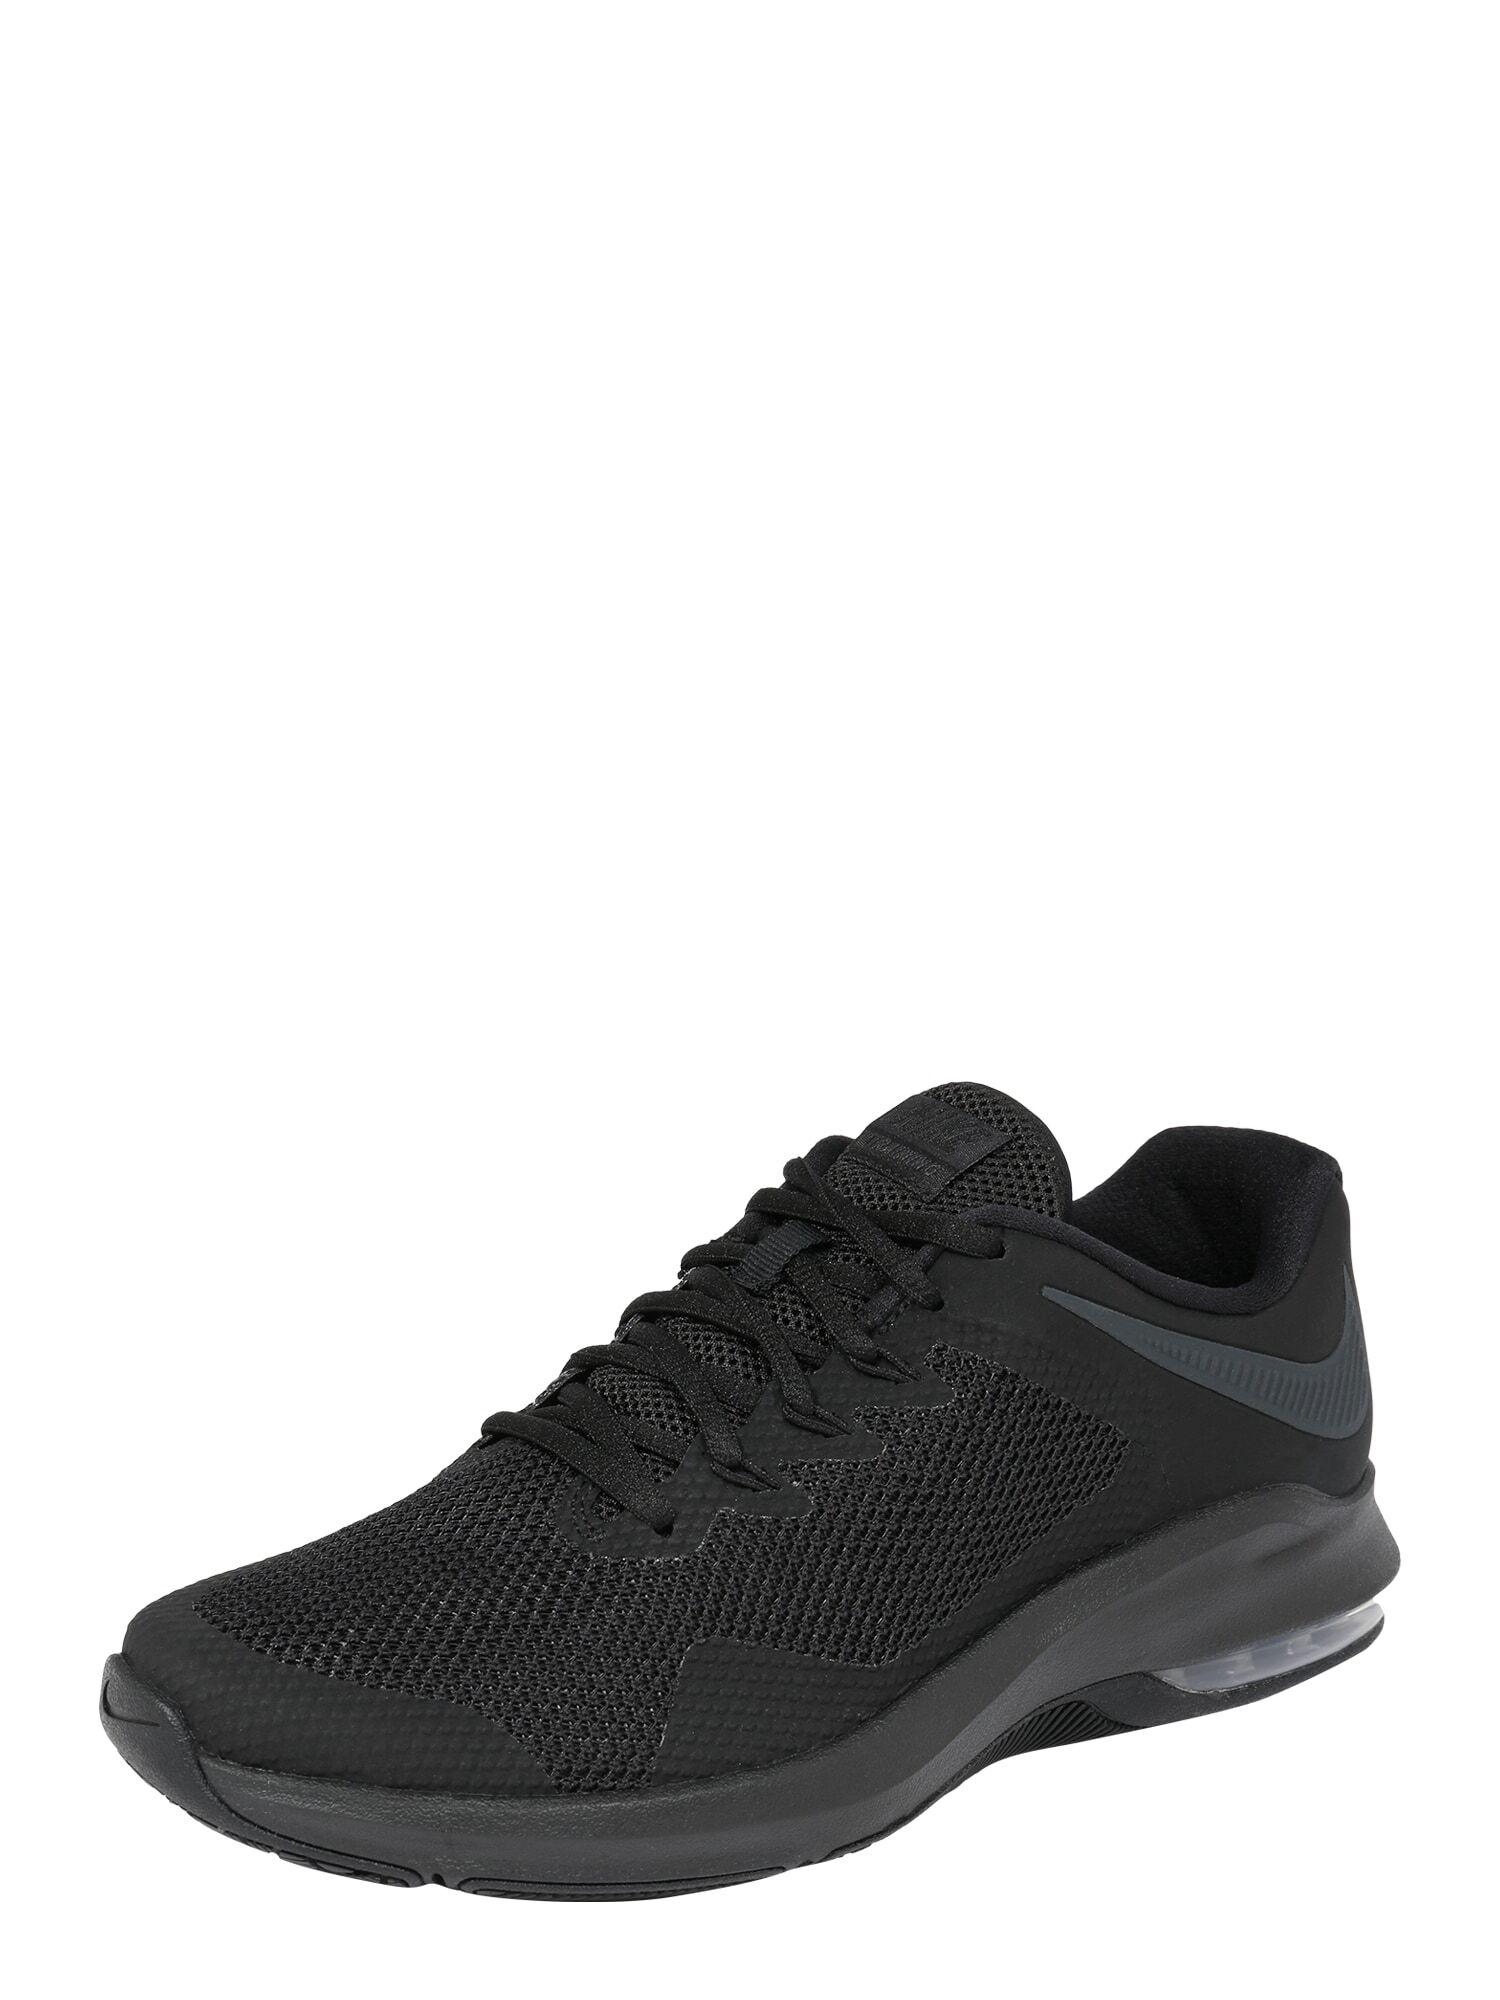 NIKE Chaussure de sport 'Alpha Trainer'  - Noir - Taille: 8.5 - male